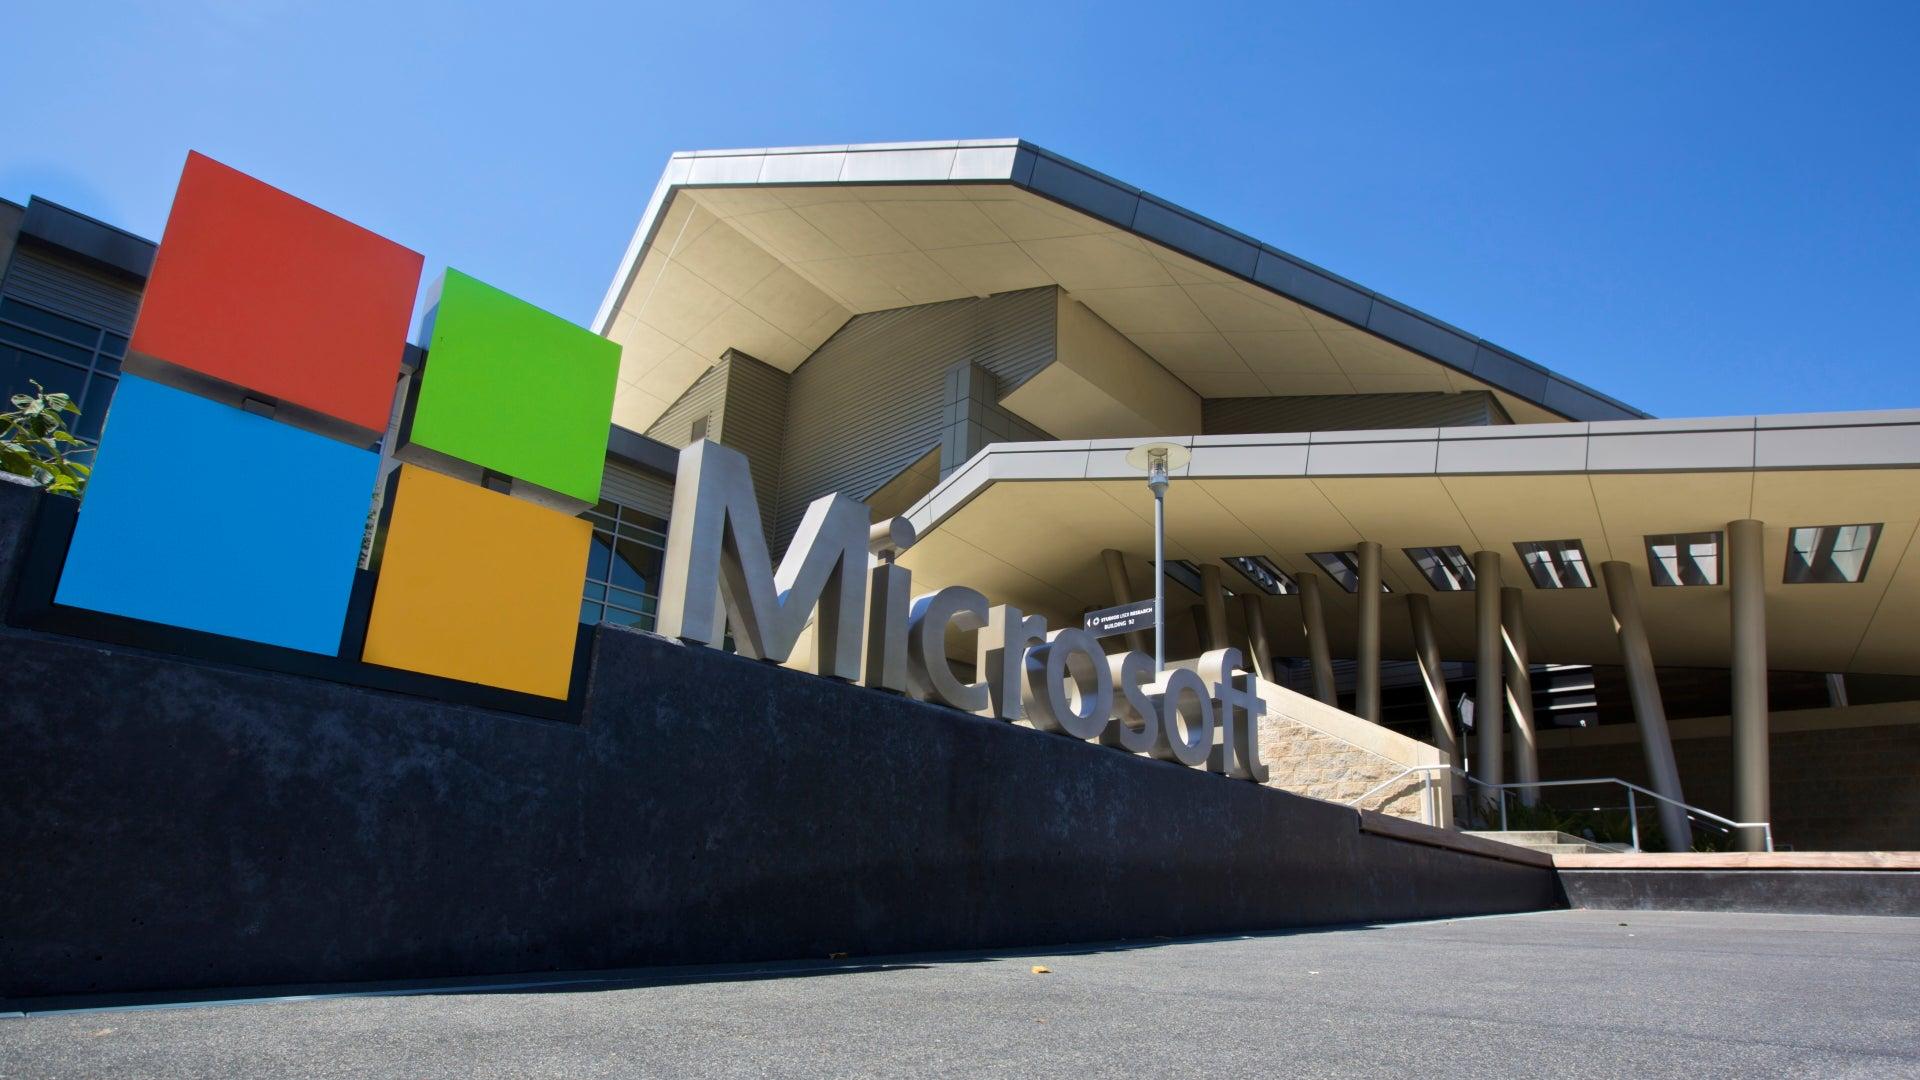 Microsoft, Bungie Enact Work-From-Home Policies In Response To Coronavirus